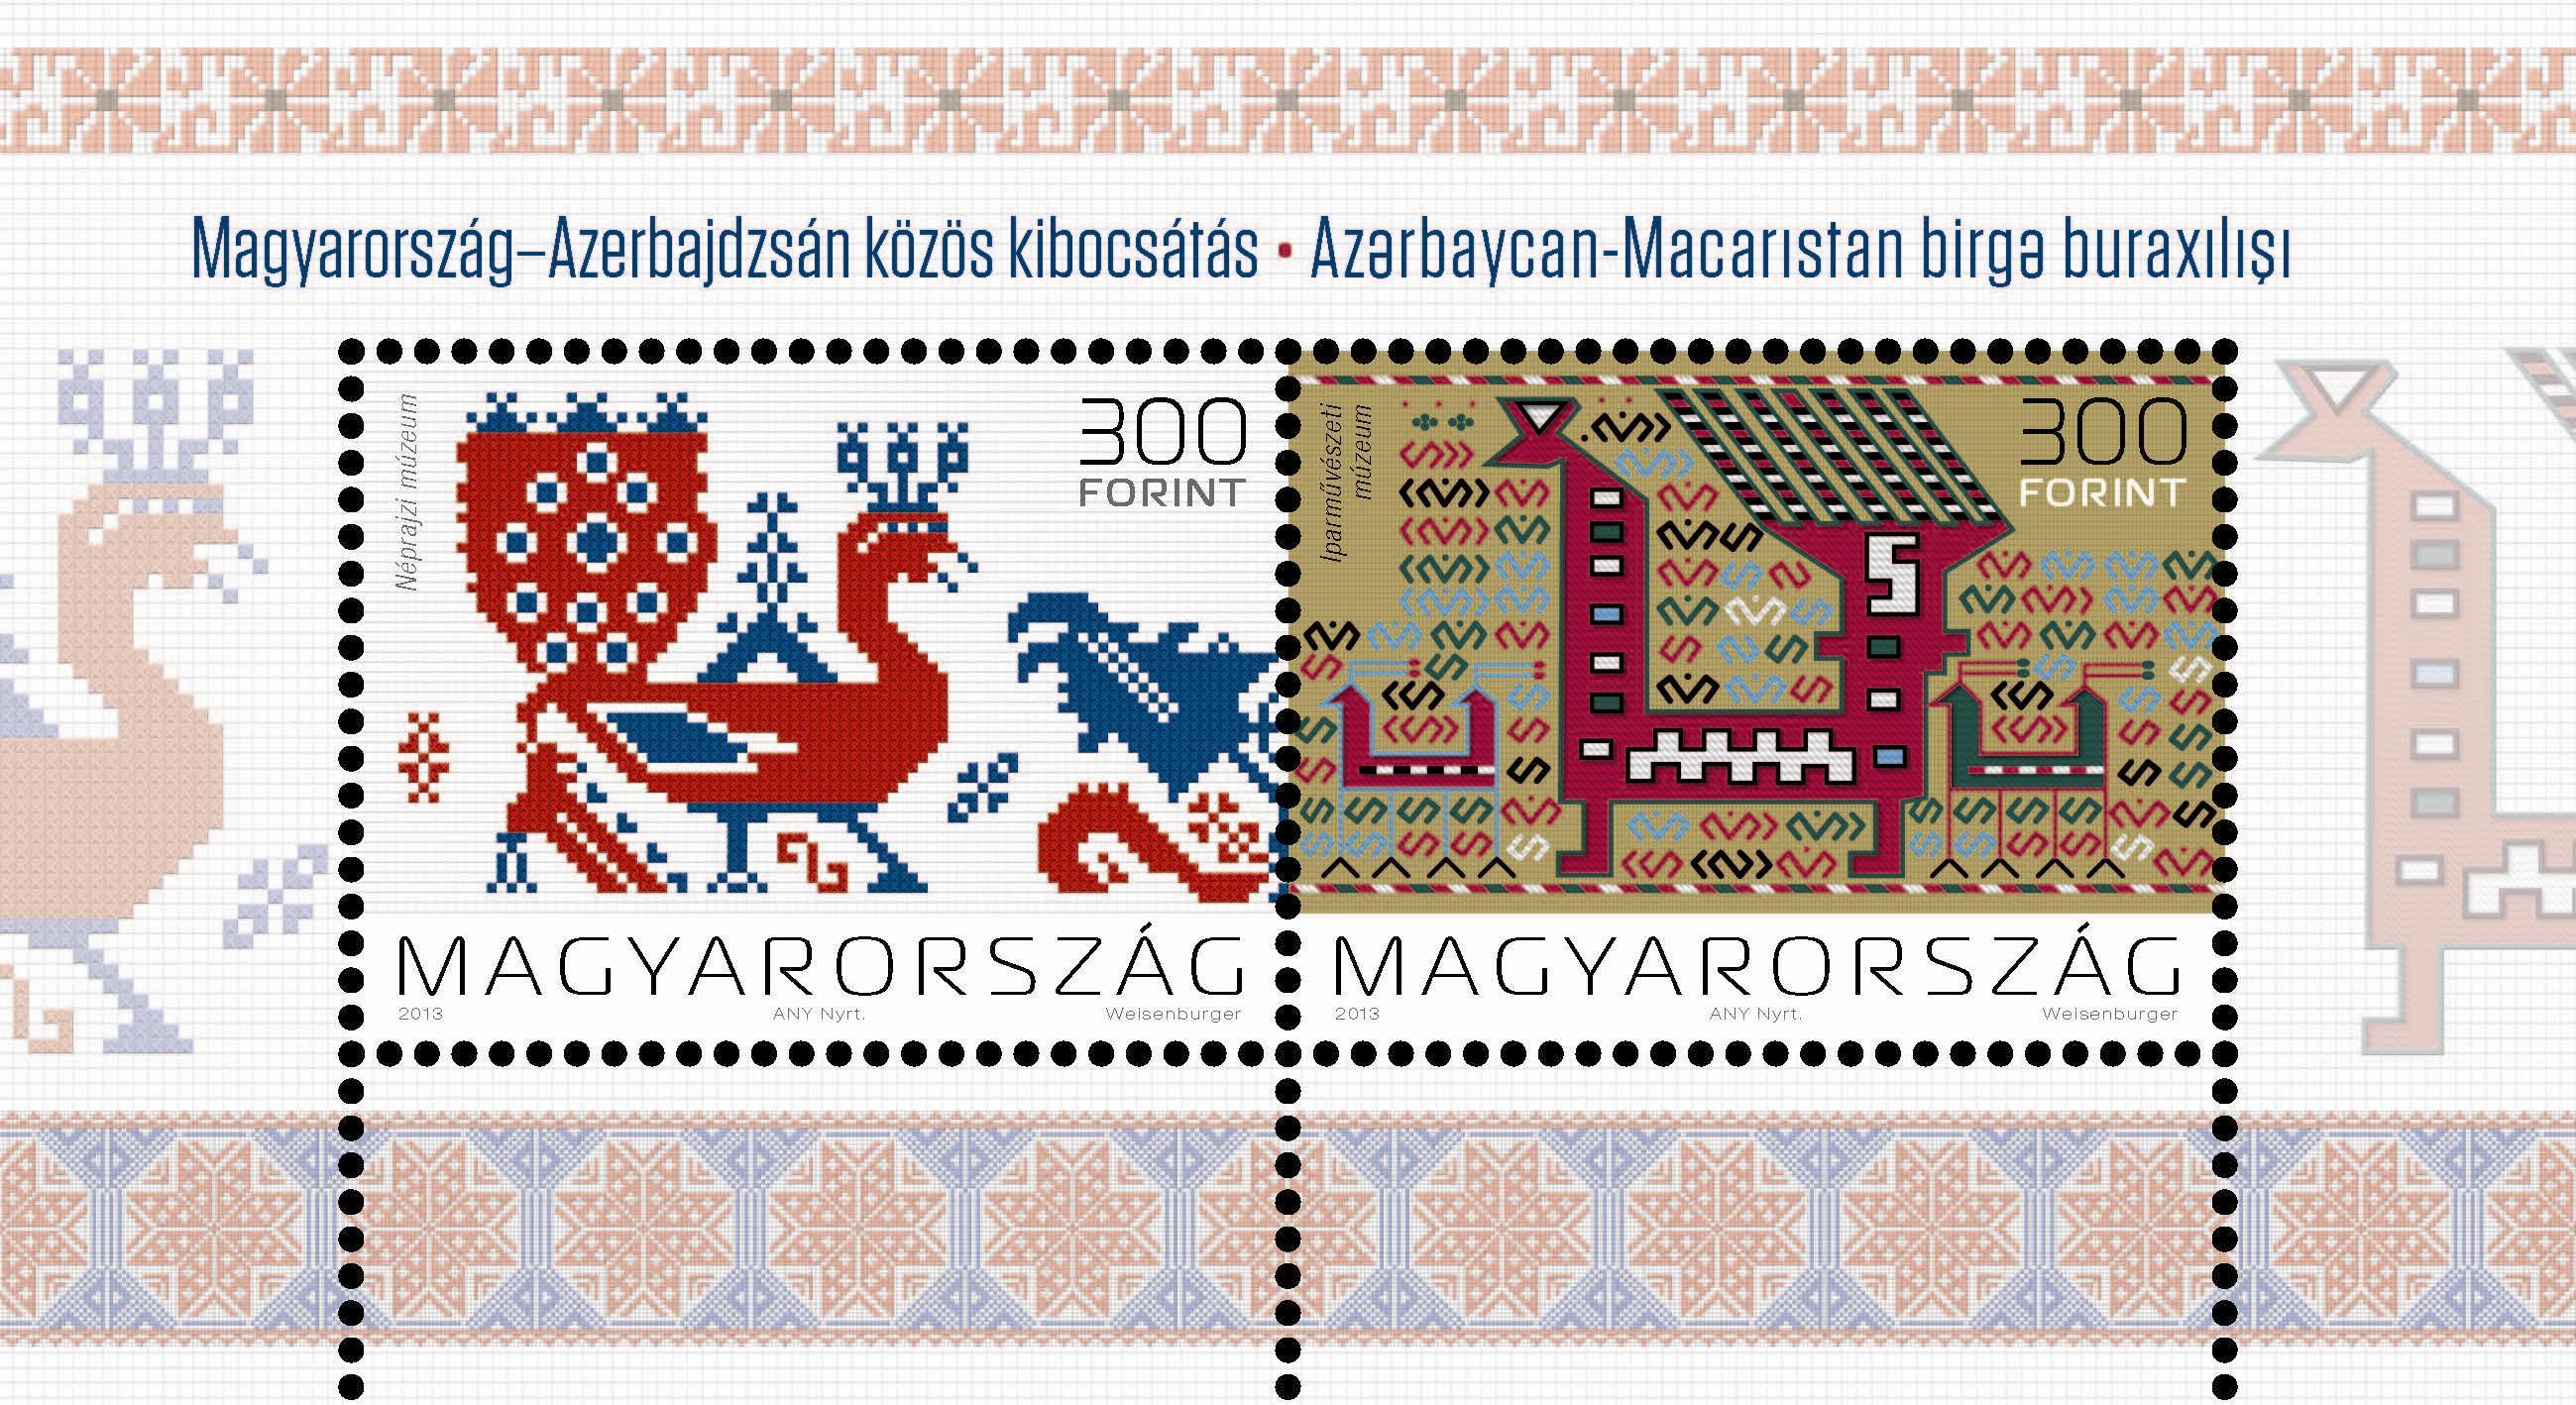 Magyar Posta Ltd 2013